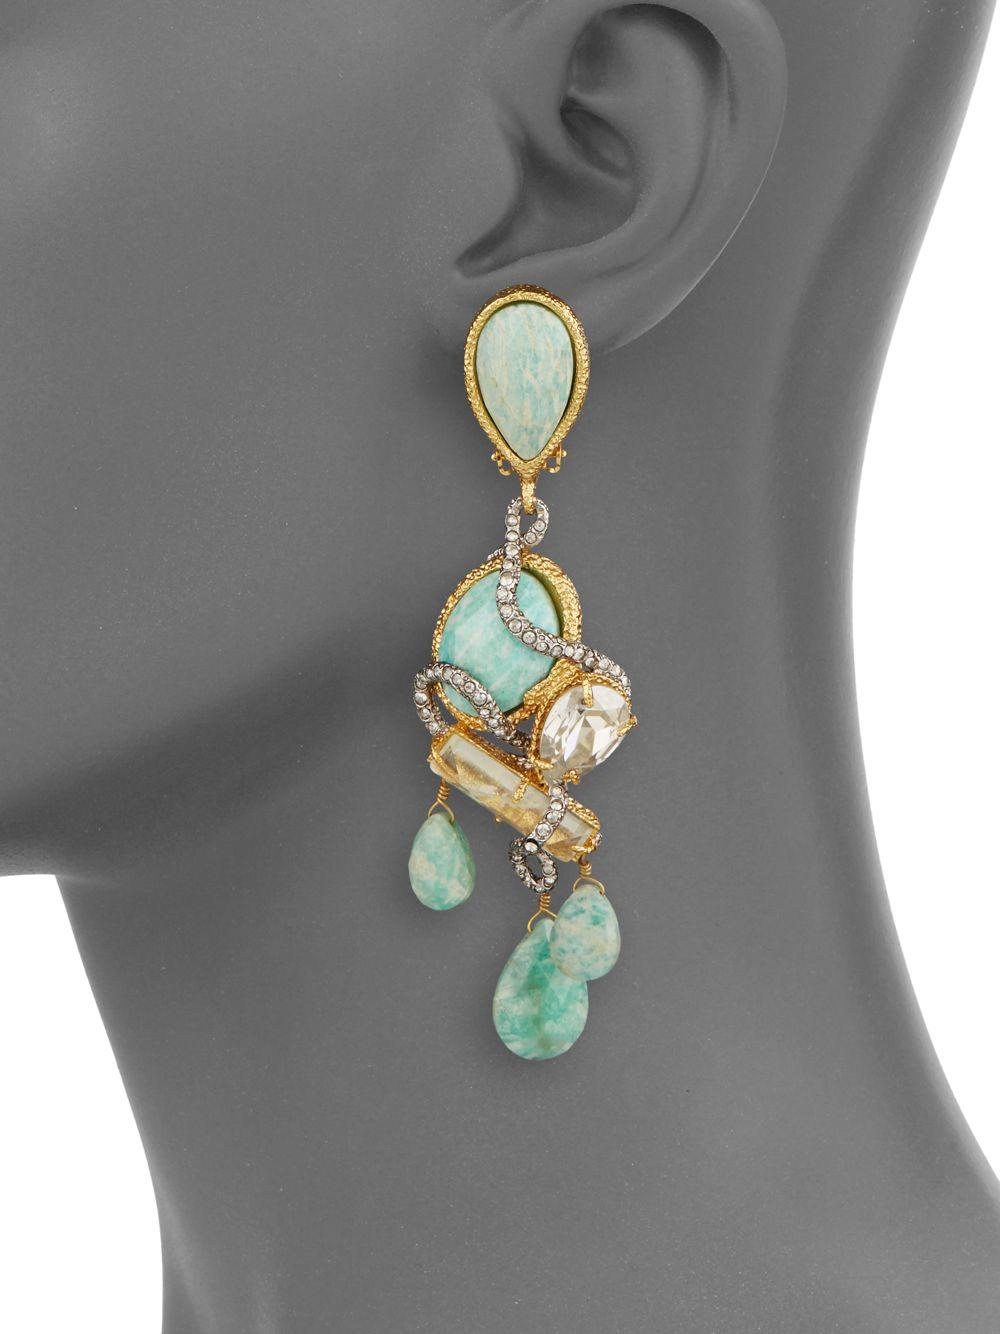 Alexis bittar Elements Aqua Crackle Glass Amazonite Crystal – Aqua Chandelier Earrings